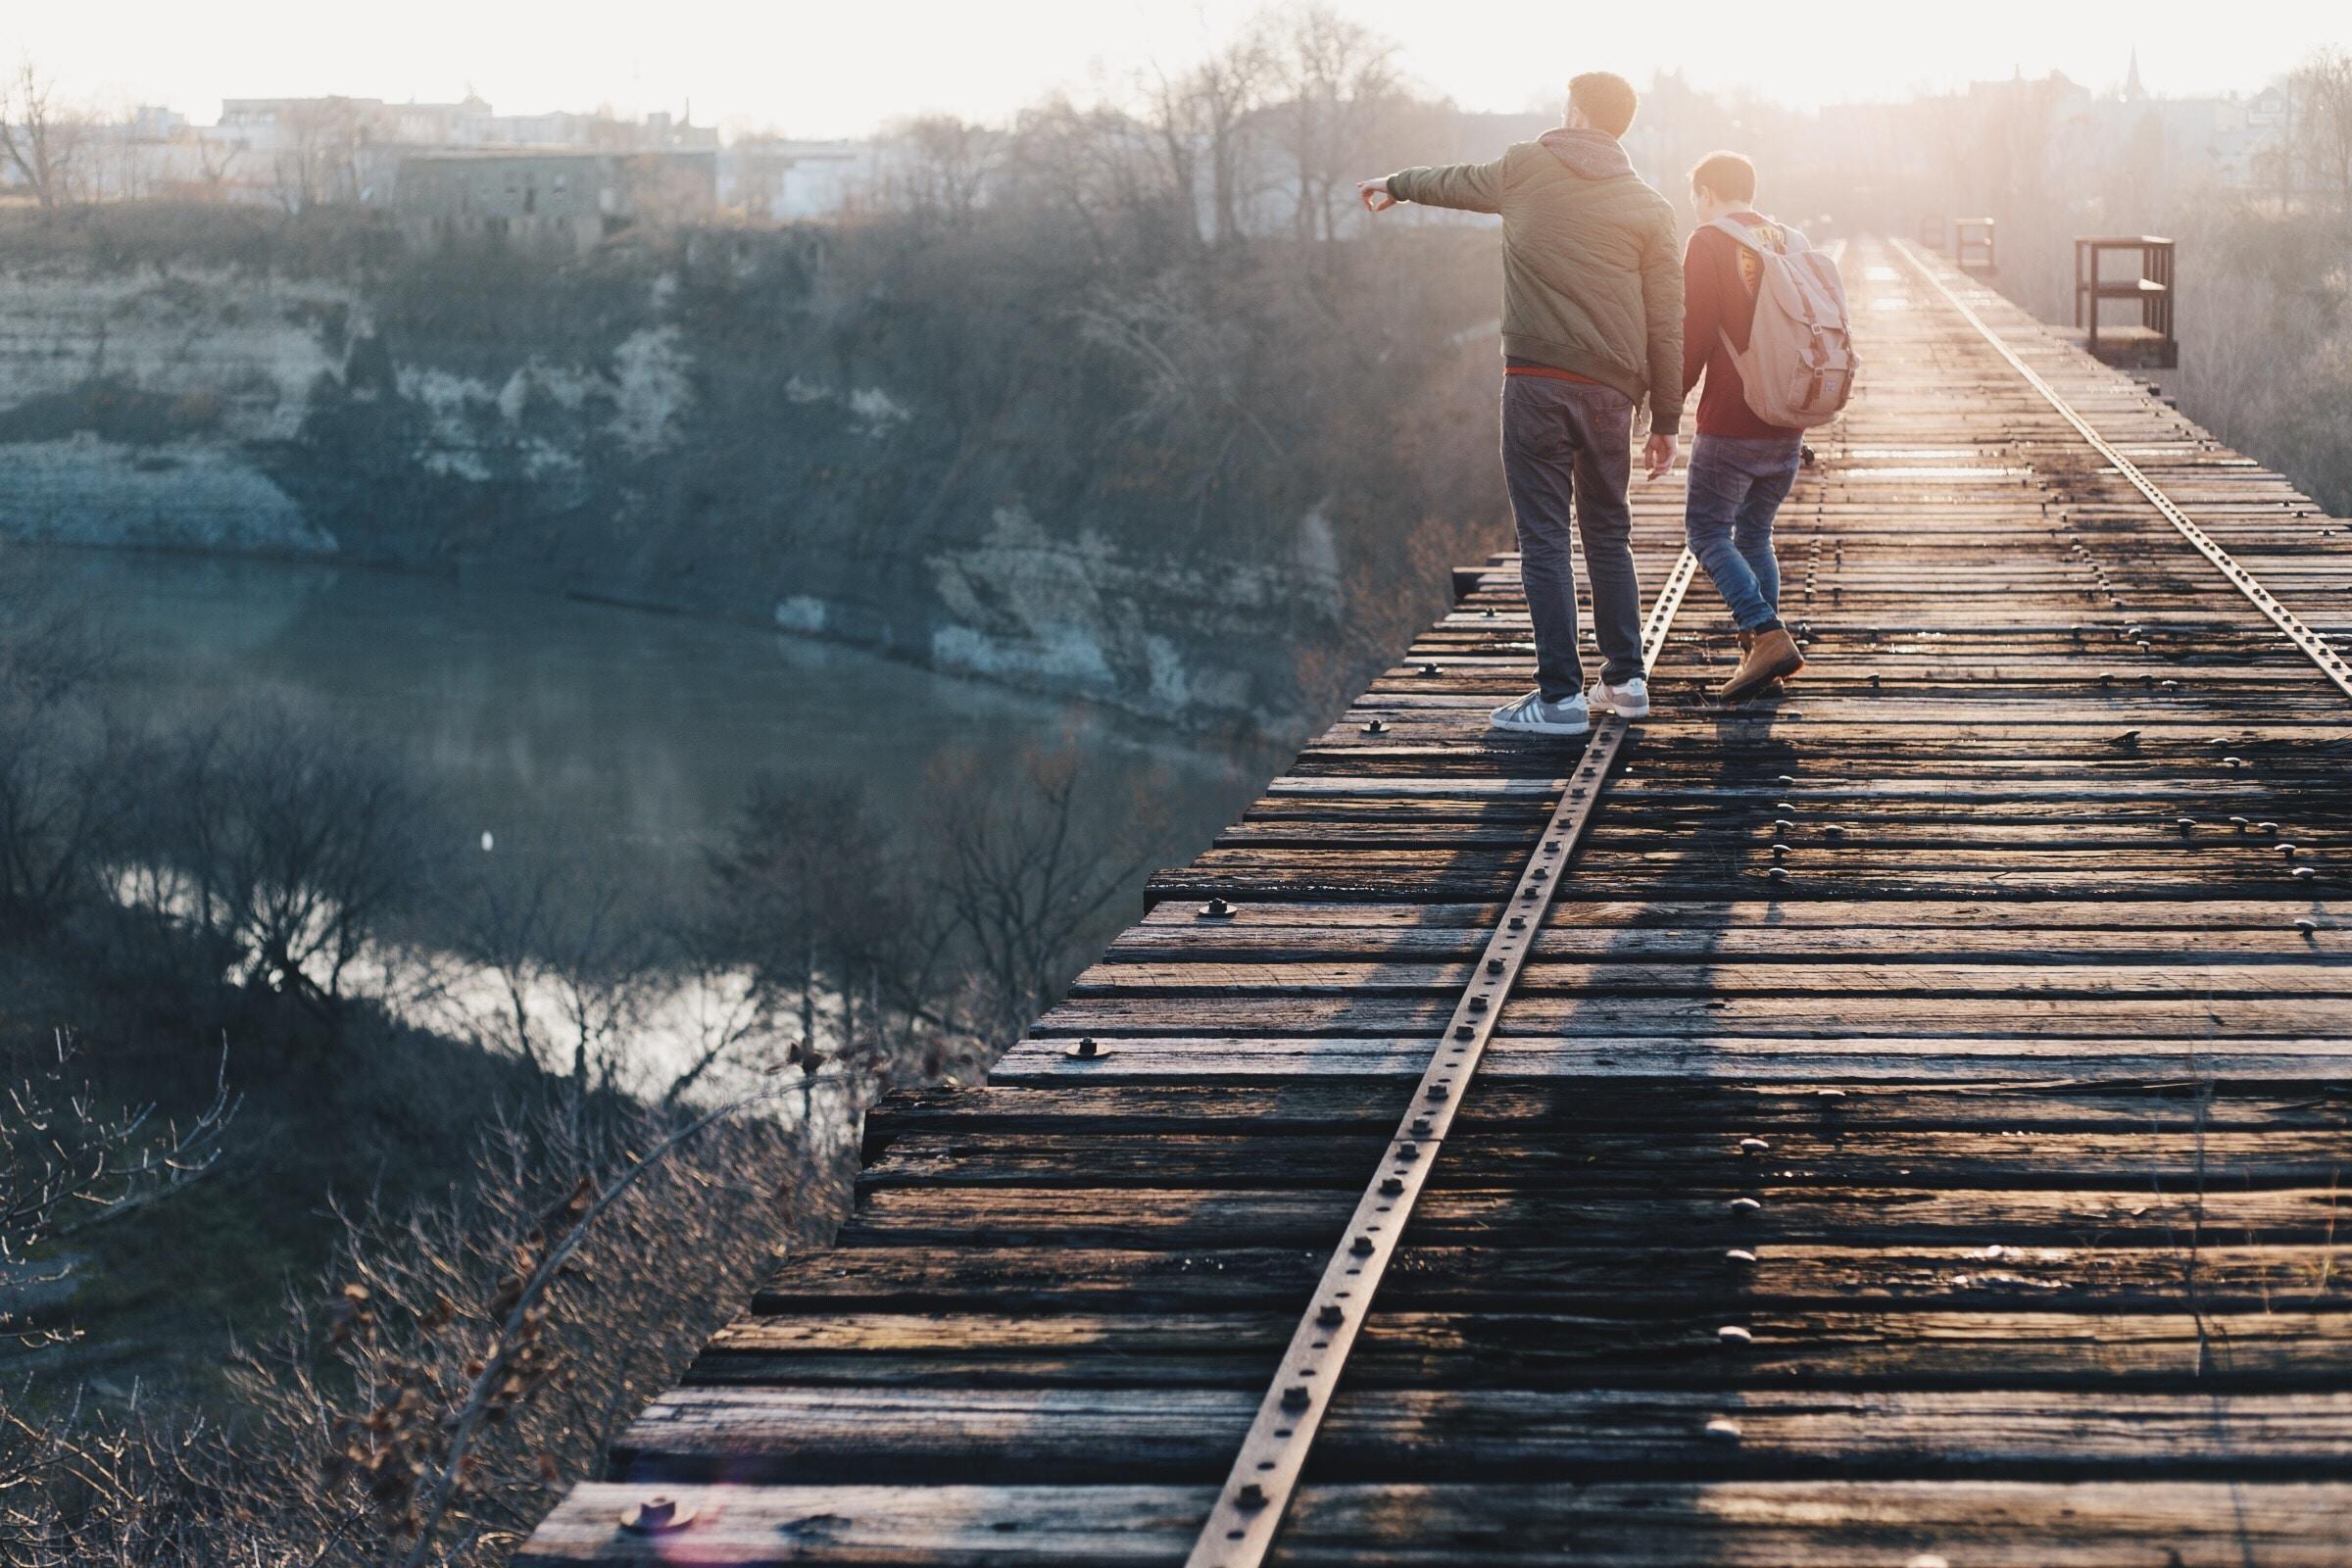 two boy standing on brown train track bridge near river